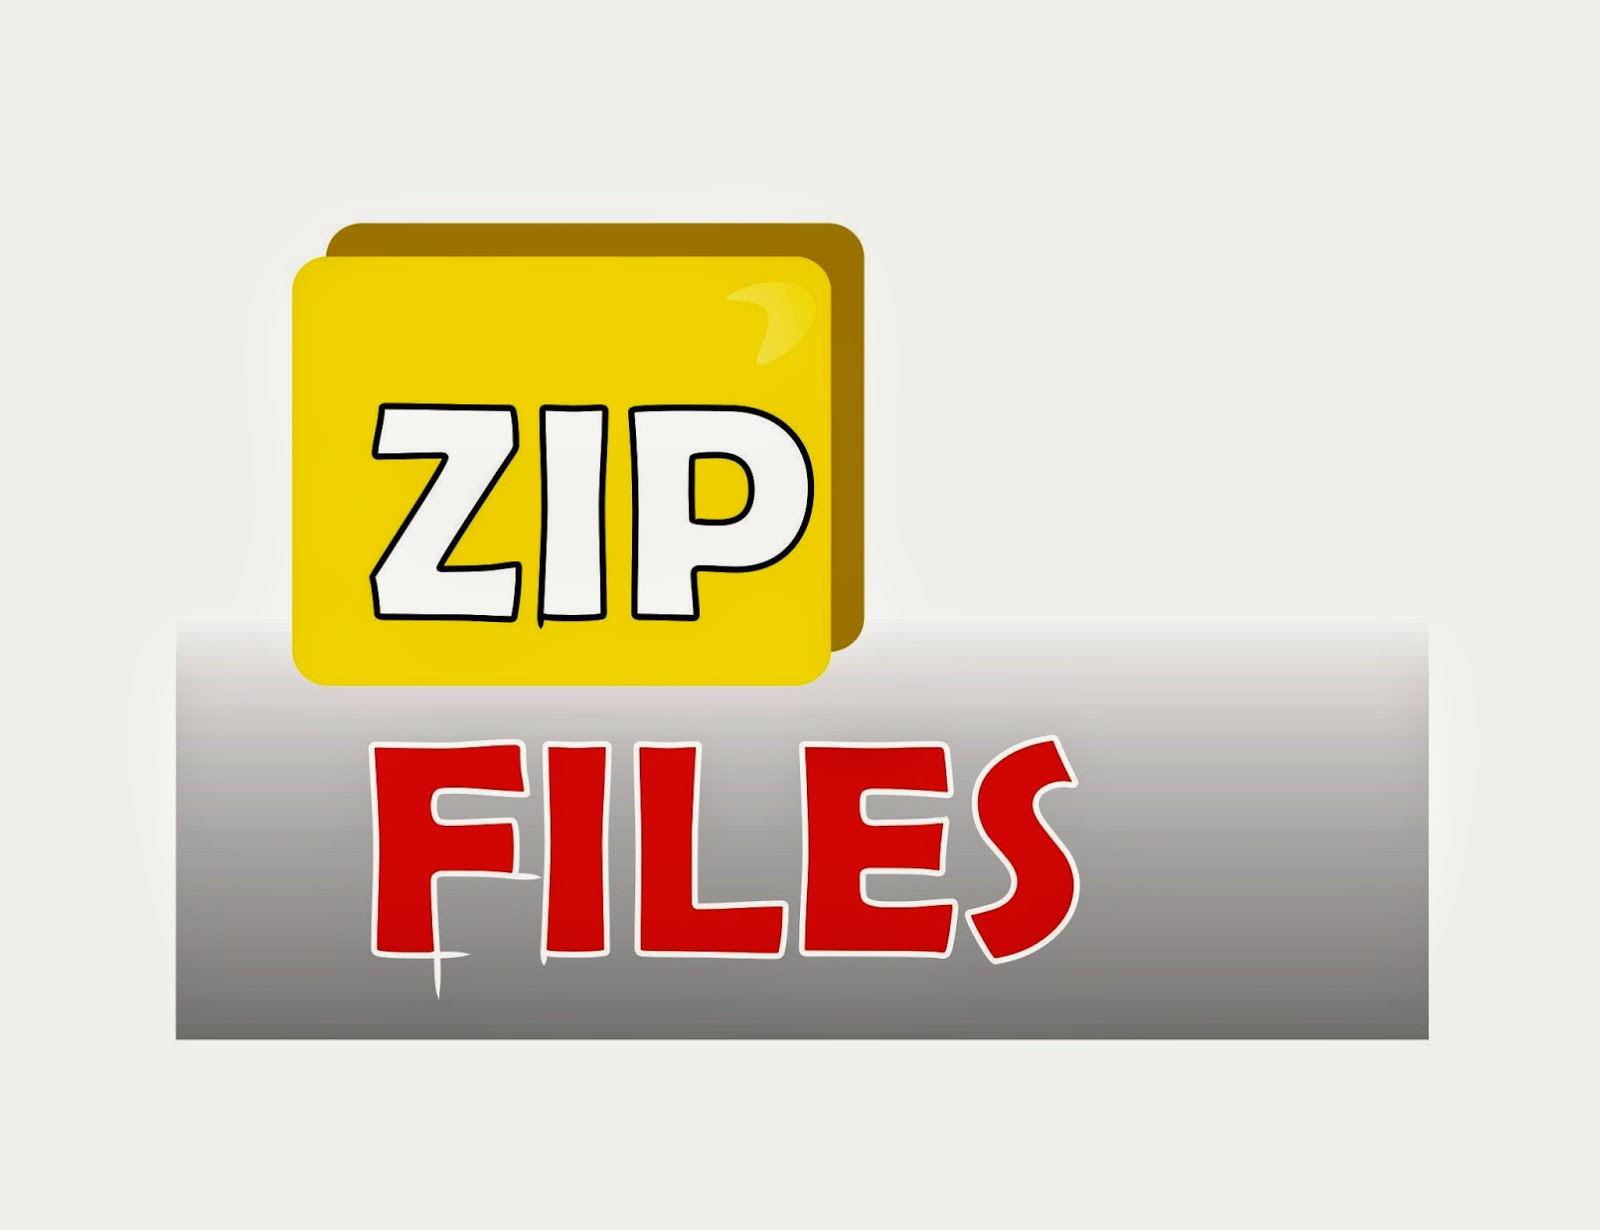 how to open zip file in phone